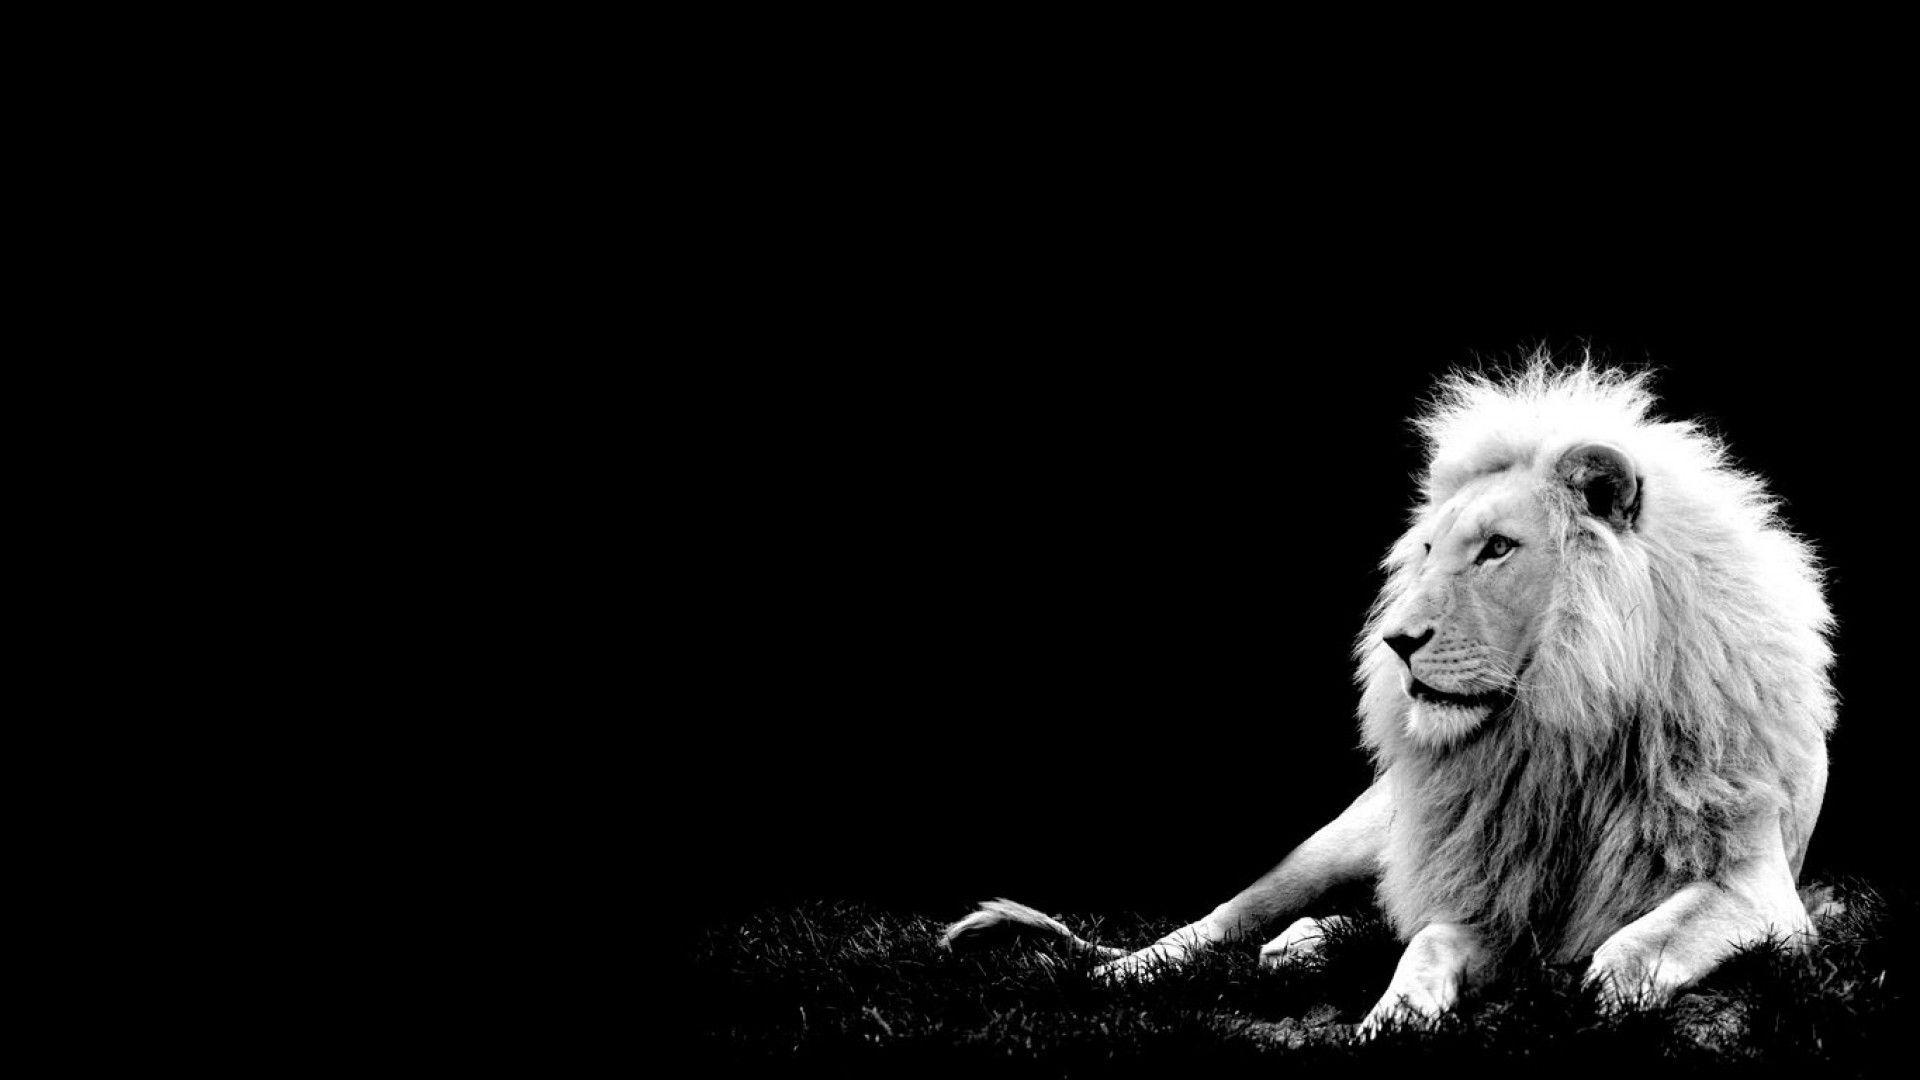 Lion Black And White Animal Free Wallpaper